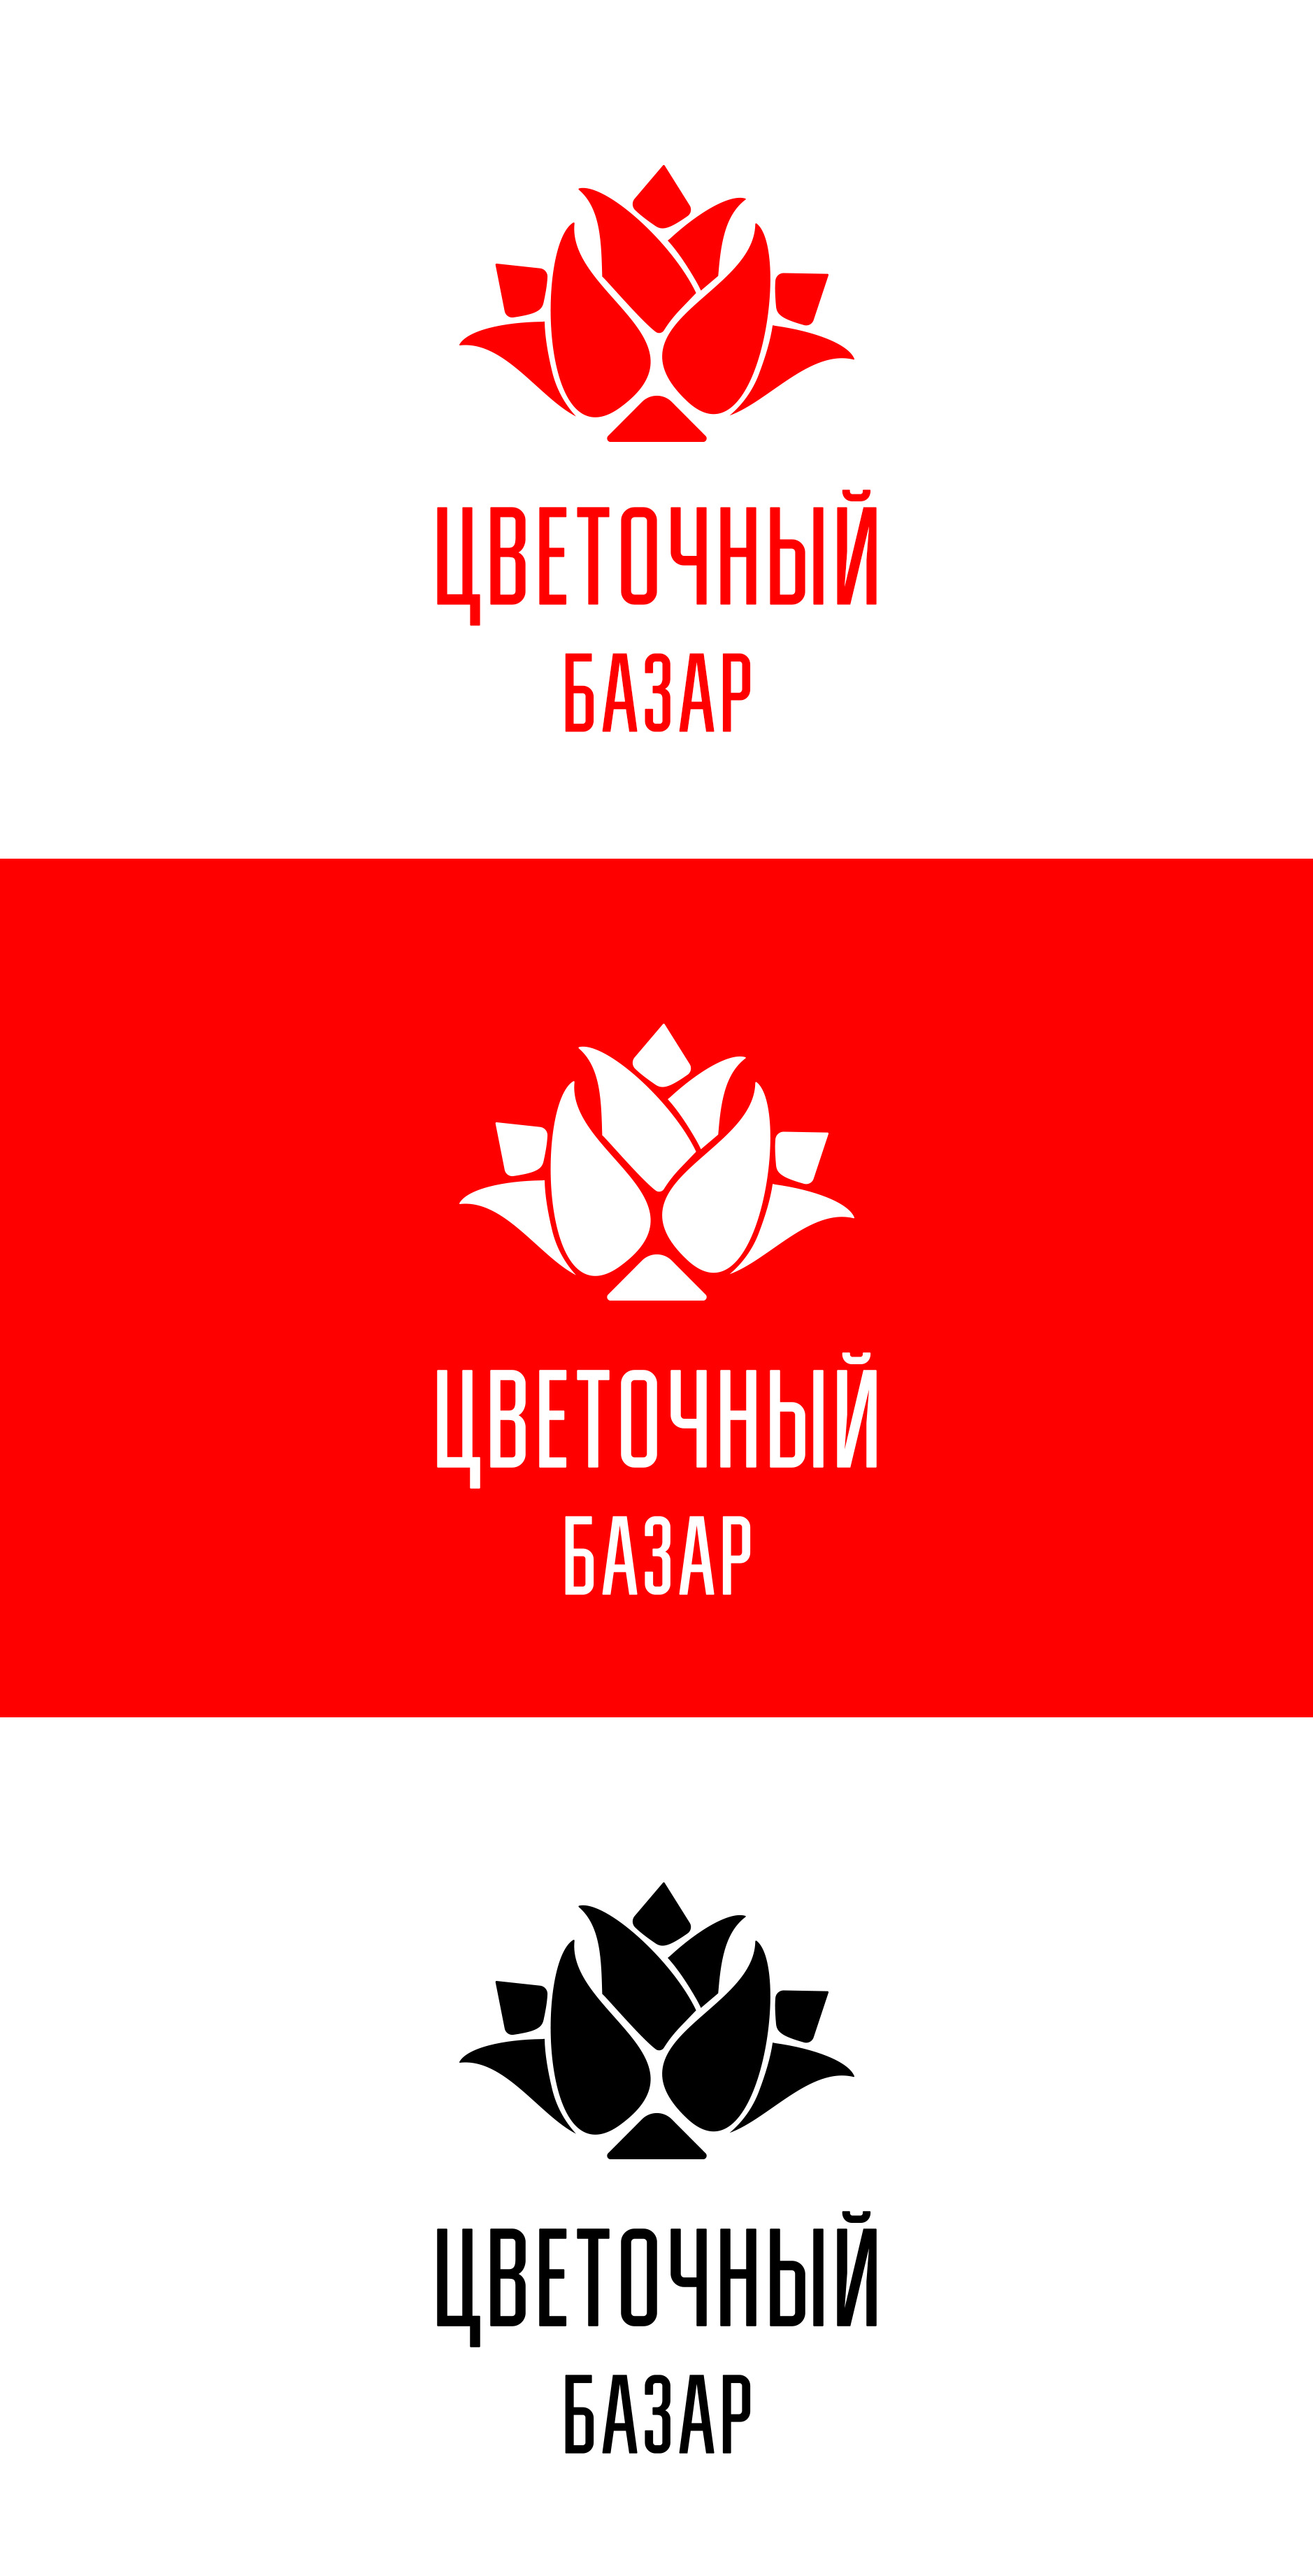 Разработка фирменного стиля для цветочного салона фото f_4765c38a955d44b7.jpg